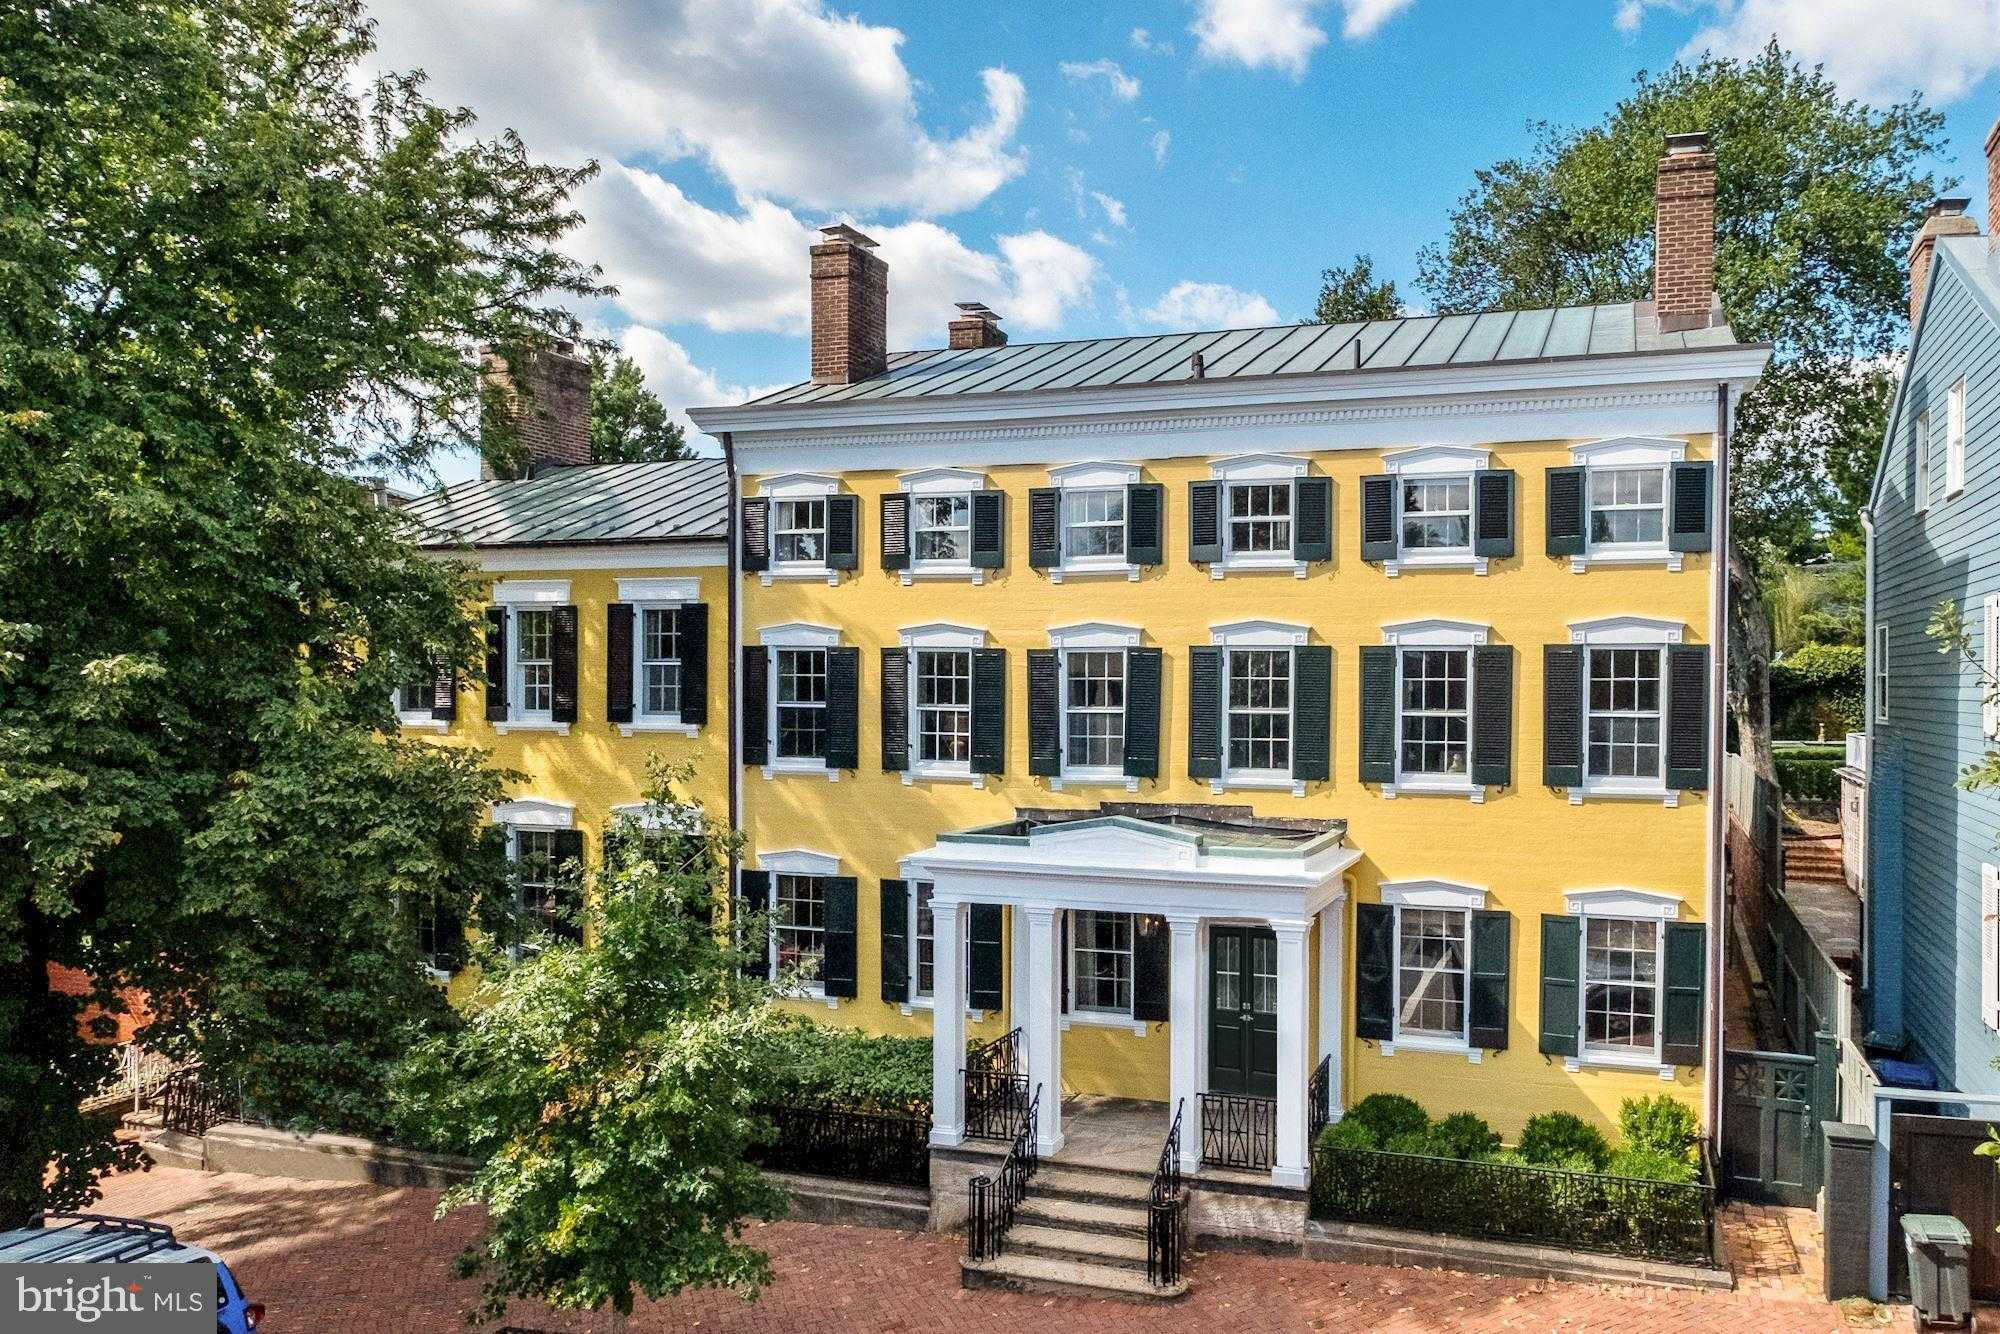 $10,800,000 - 10Br/8Ba -  for Sale in Georgetown, Washington